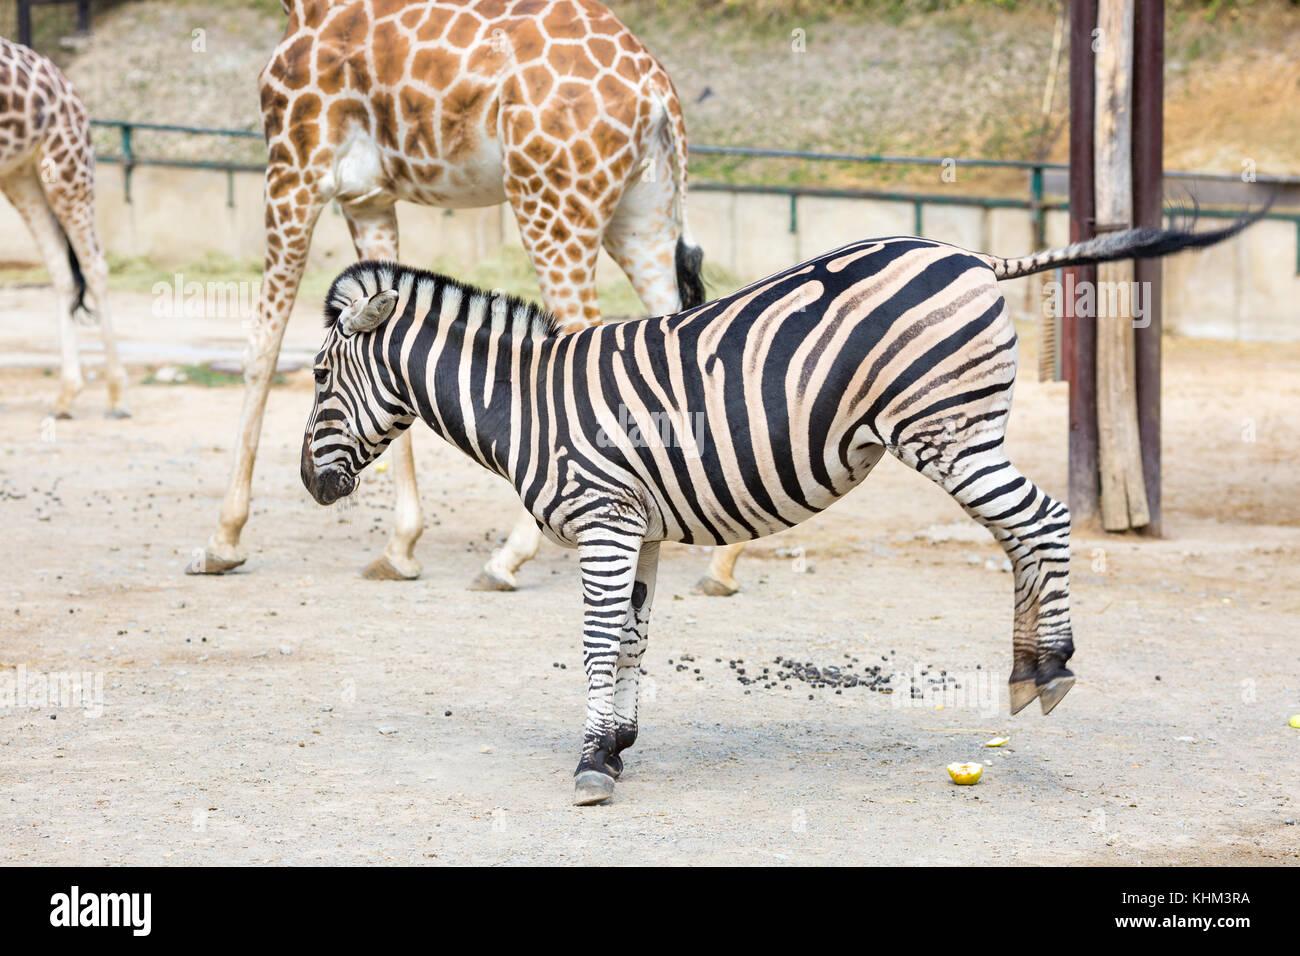 Giraffe Zebra Zoo Stock Photos Amp Giraffe Zebra Zoo Stock